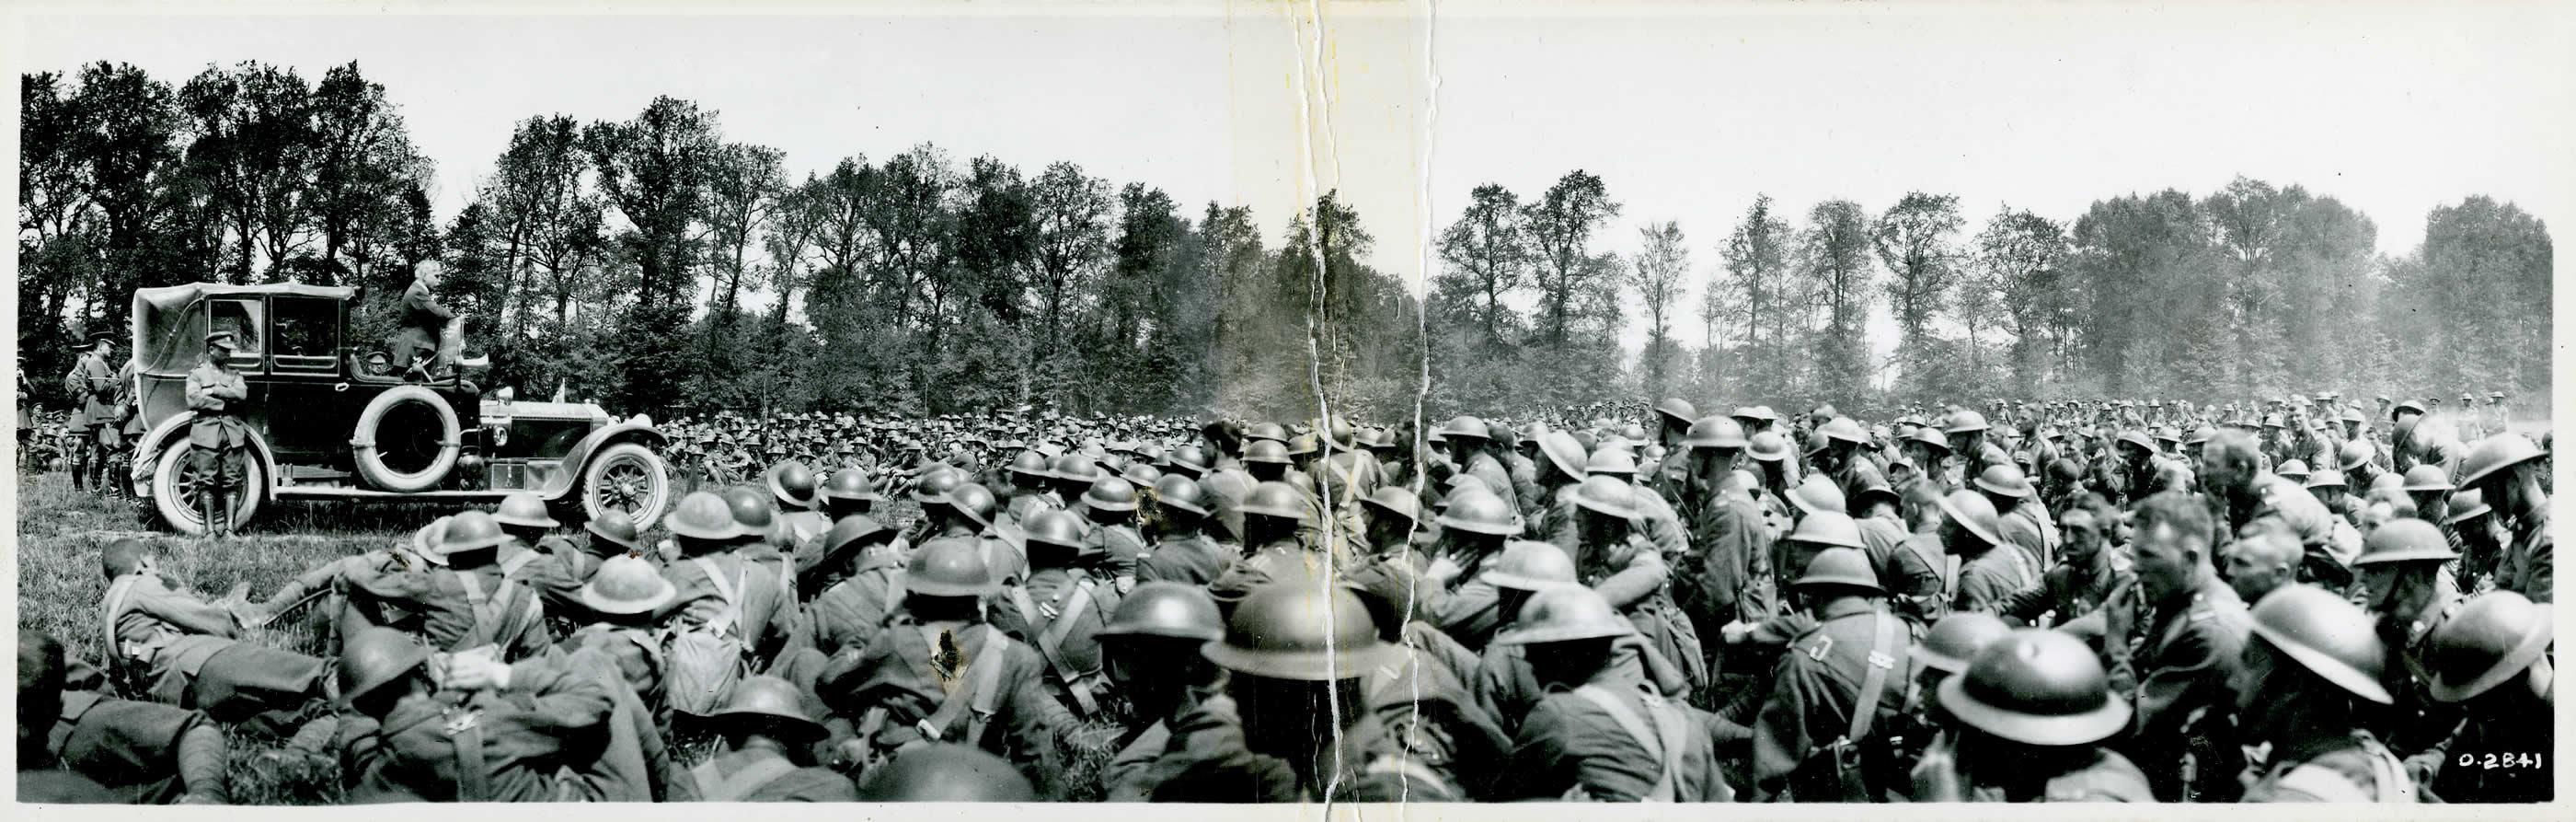 Civilian-Soldiers